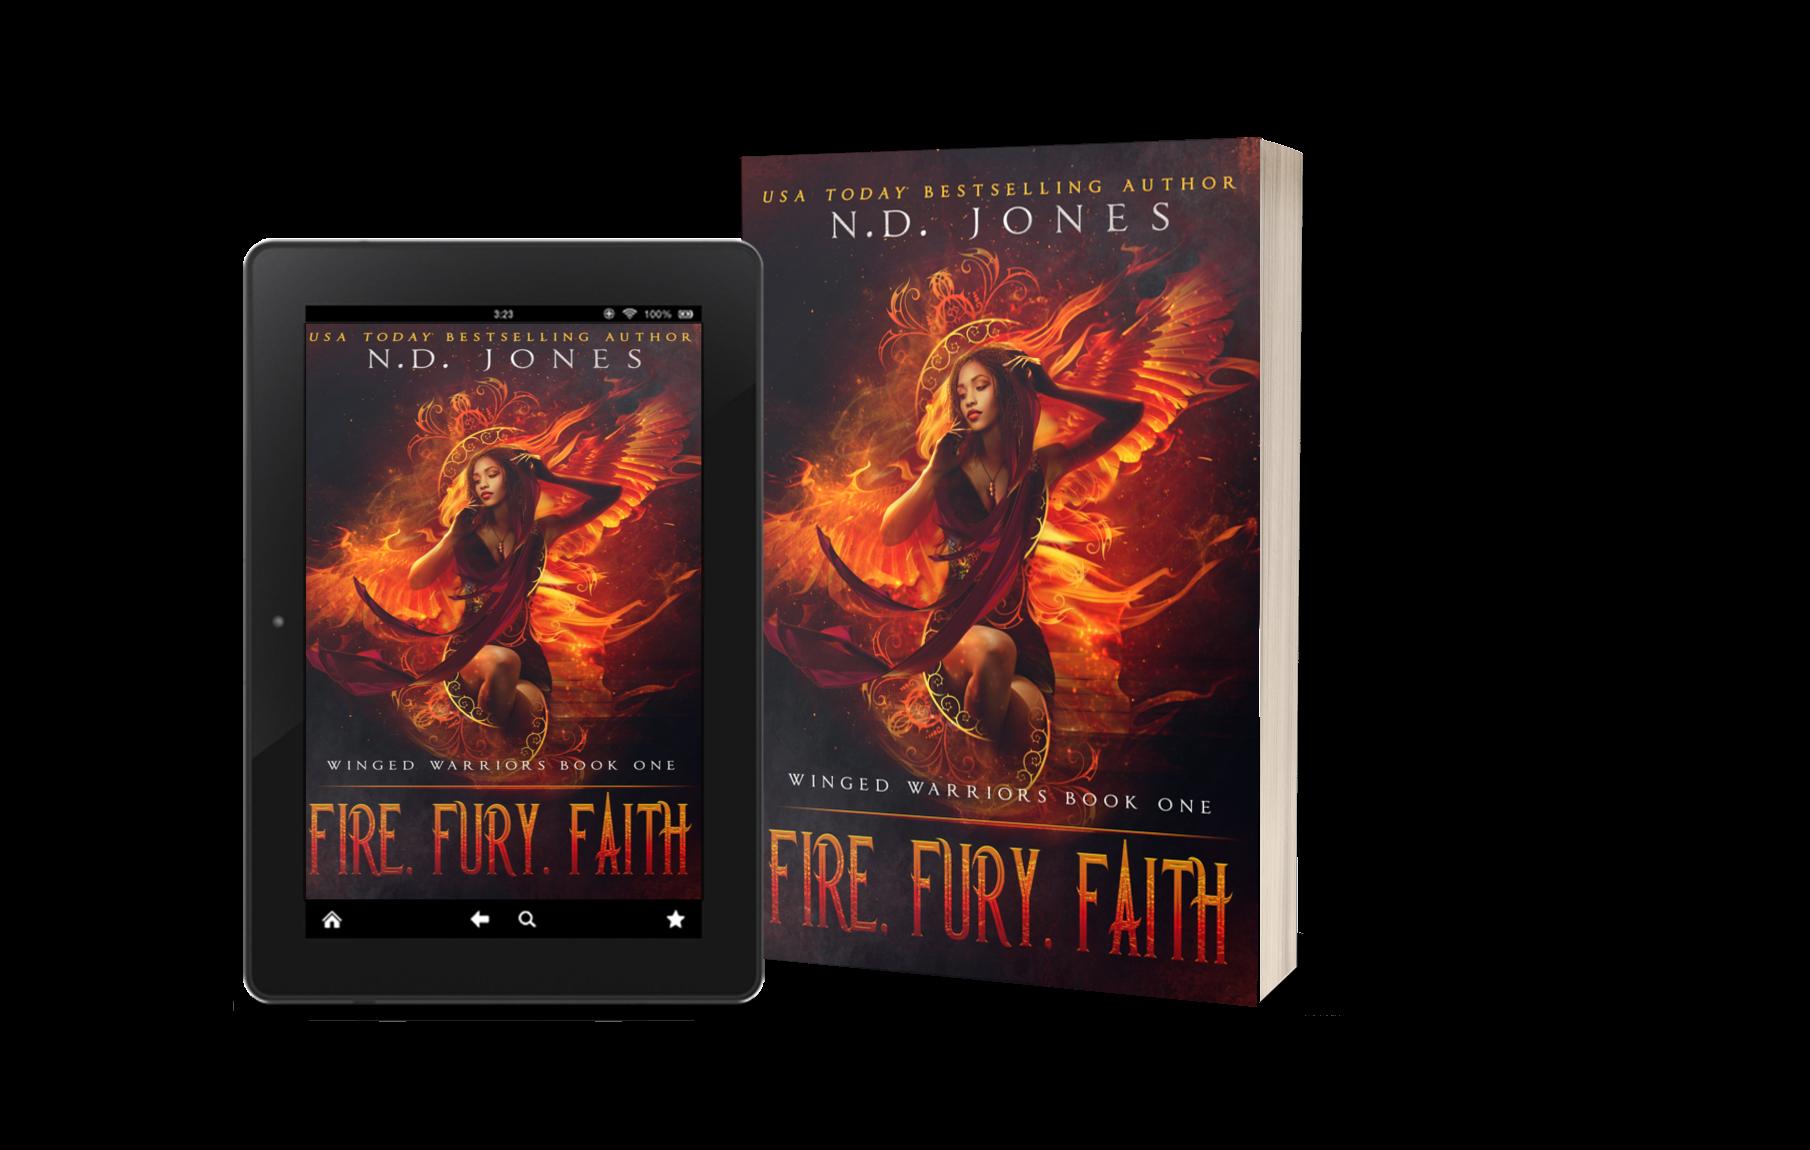 Fire Fury Faith Angel Fantasy Romance by Paranormal Romance author ND Jones